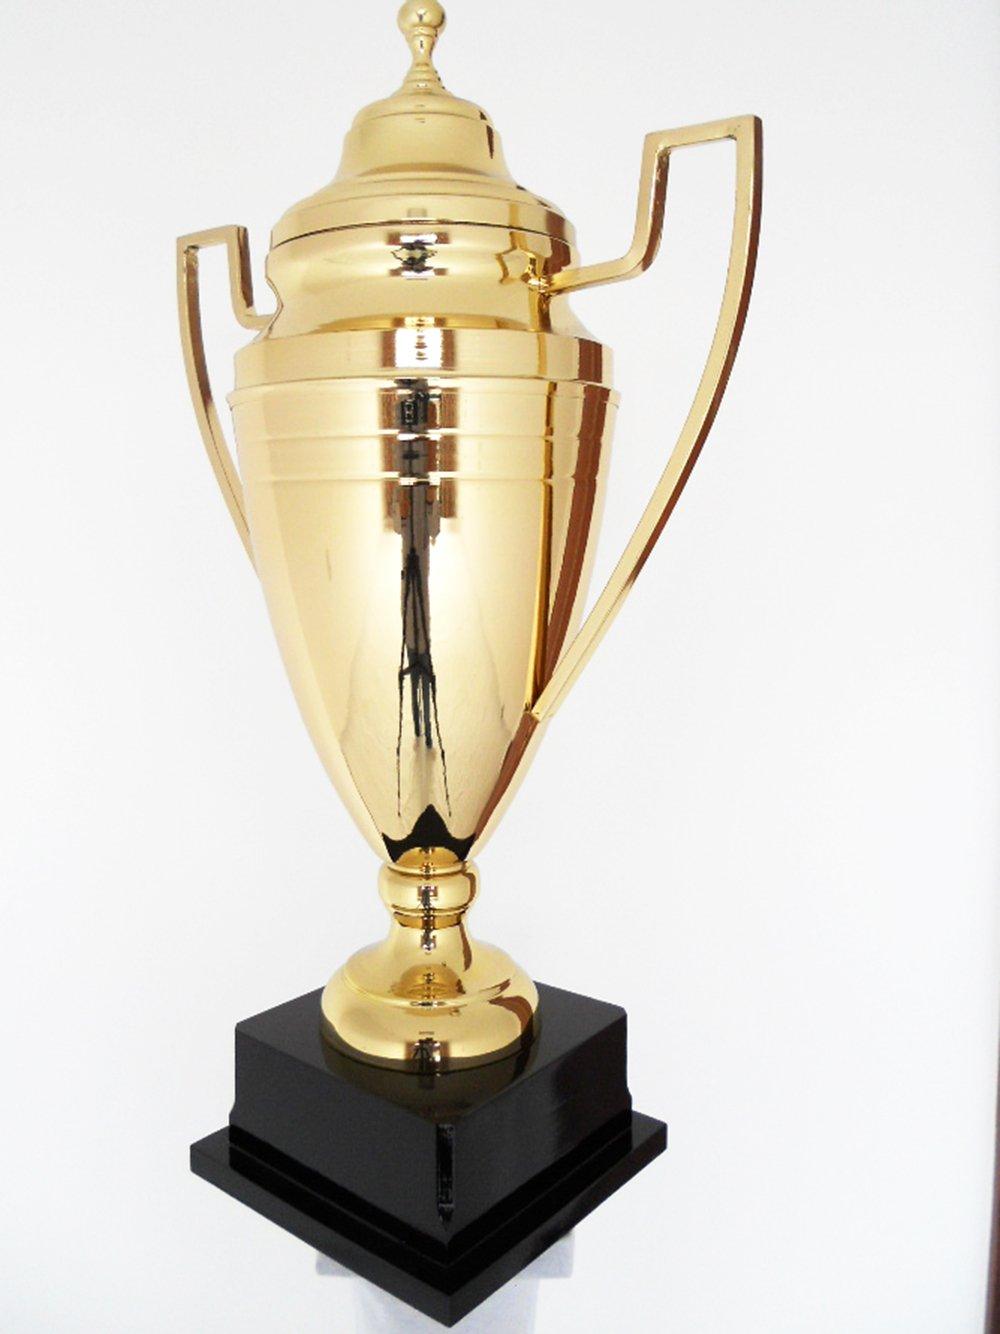 Bigサイズ56 cm 22インチゴールドメタルCup Trophy – テニスAwardスポーツAward B075JJZ69T